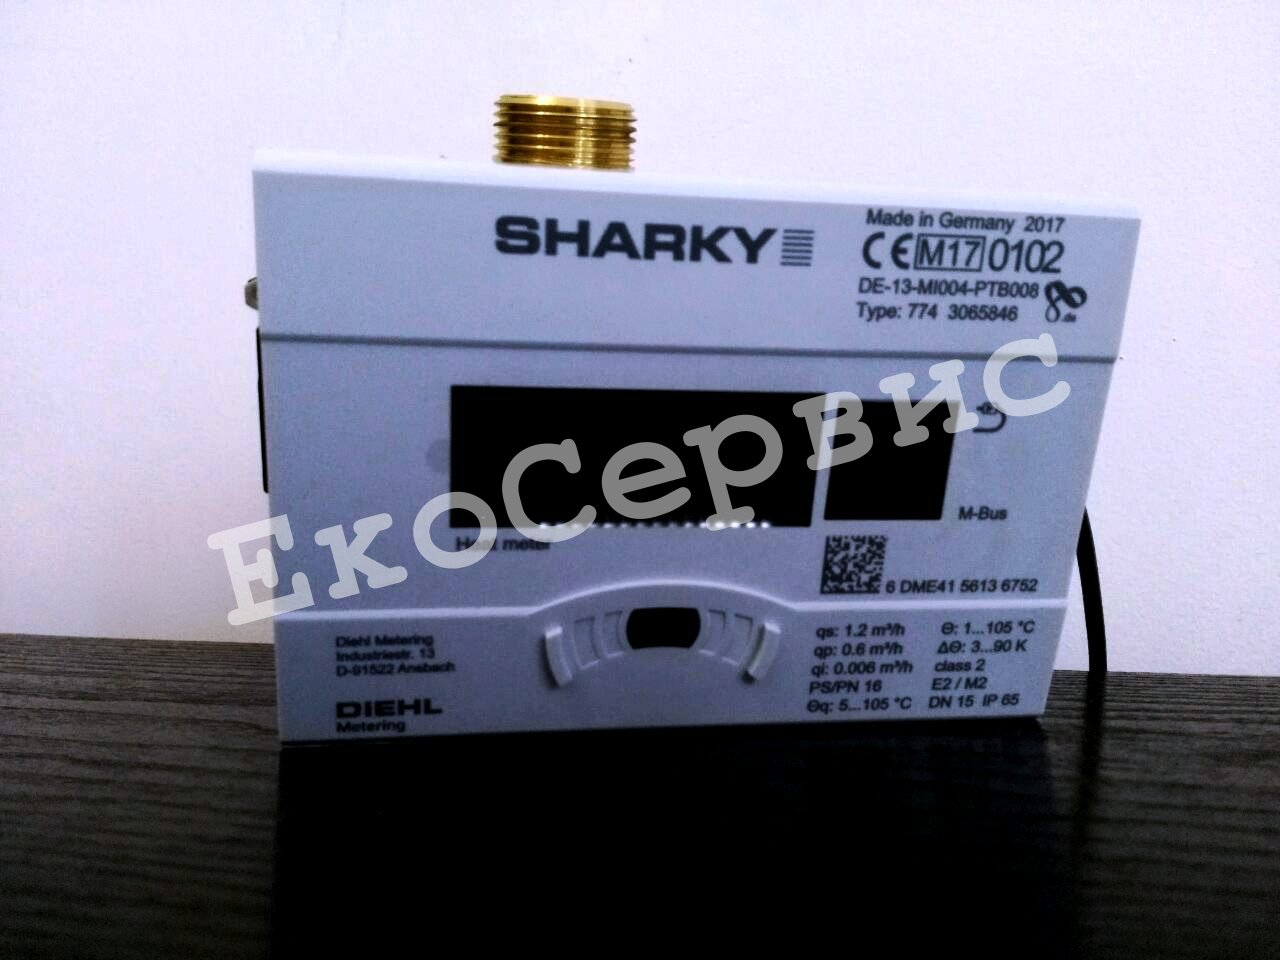 Sharky 774